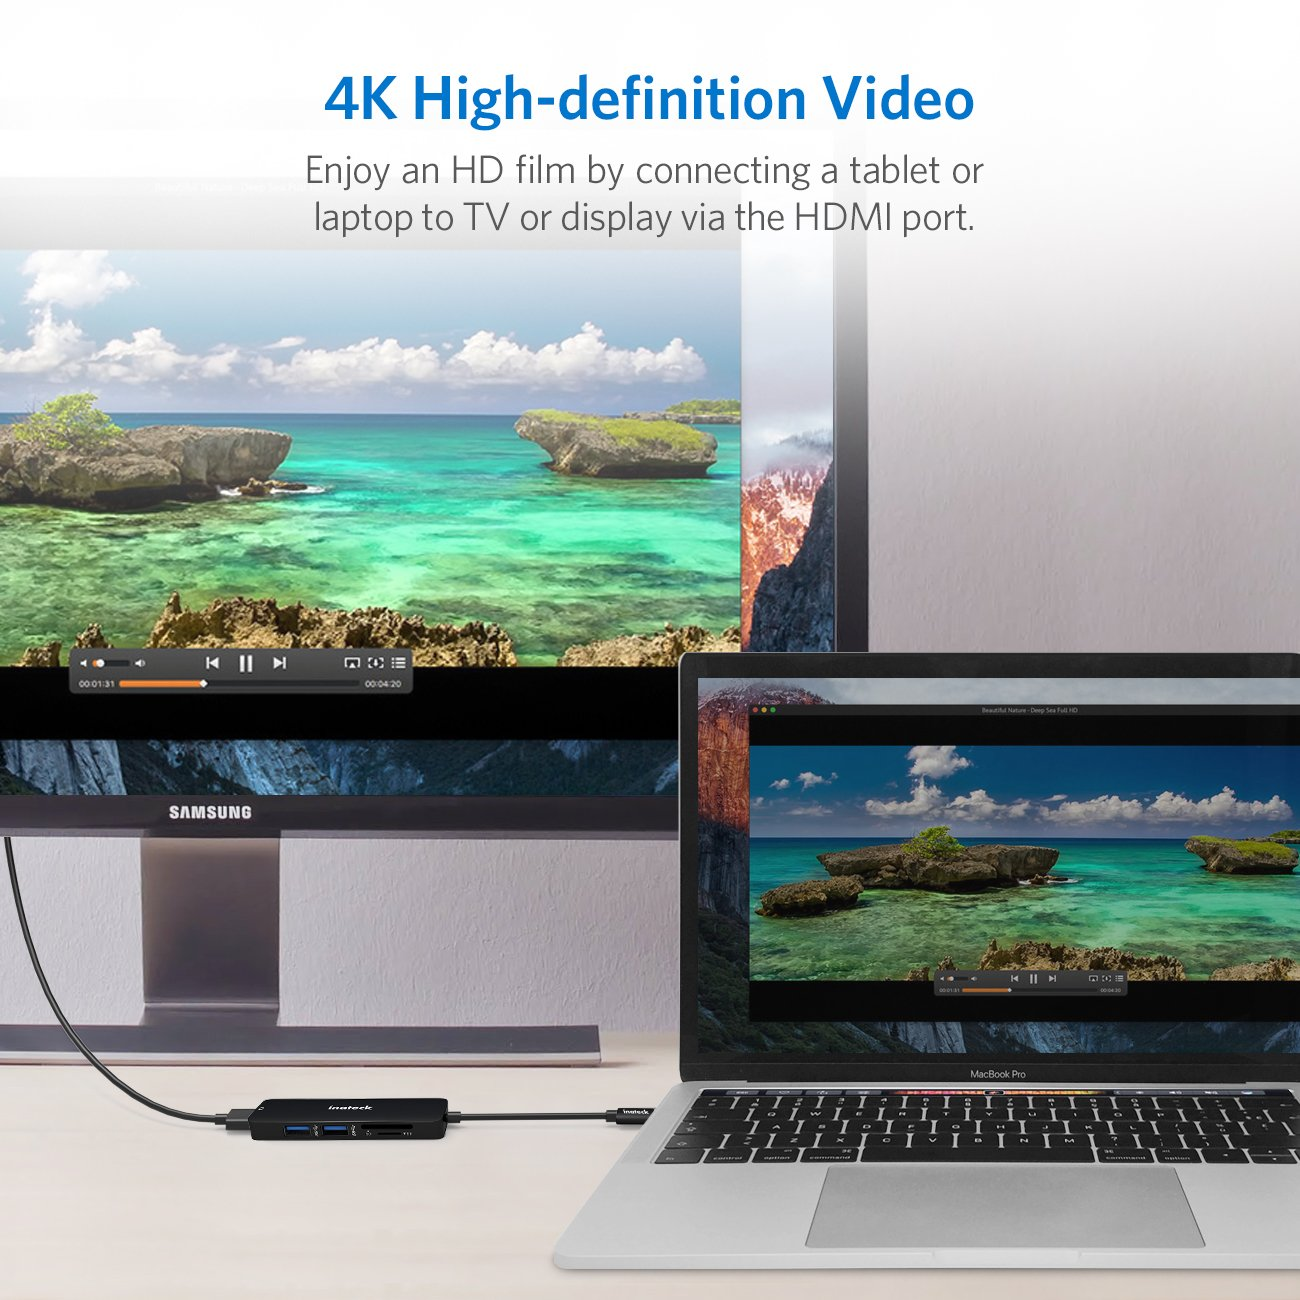 2 USB 3.0 Ports f/ür USB-C Ger/äte Inateck USB-C Hub Aluminium USB 3.1 Gen1 Typ C Hub Adapter 4K HDMI Video Ausgang Schwarz SD//Micro SD Kartenleser